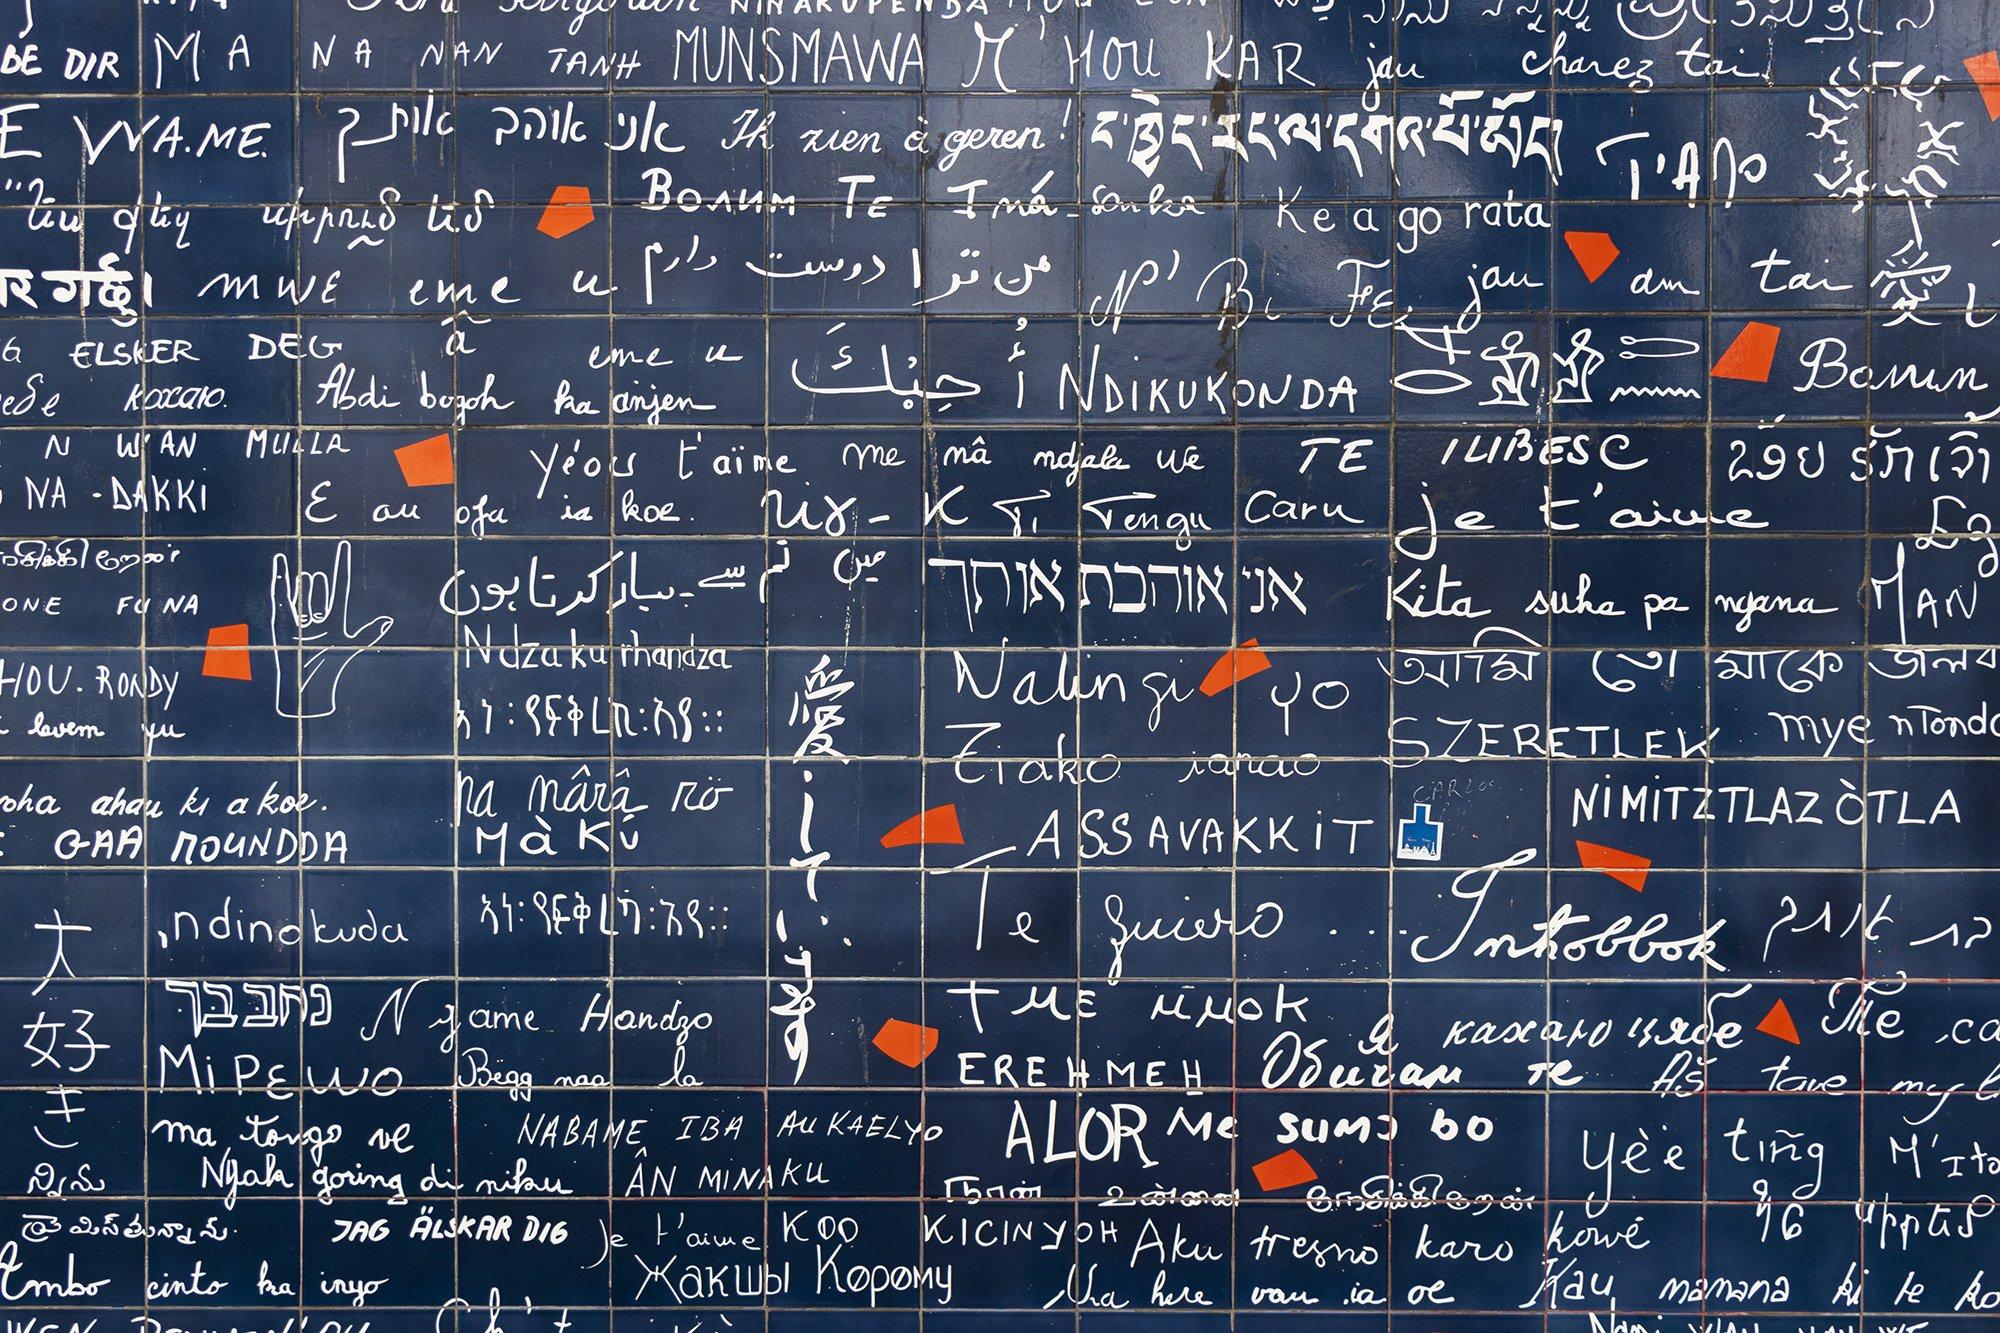 Wall of Love, Paris